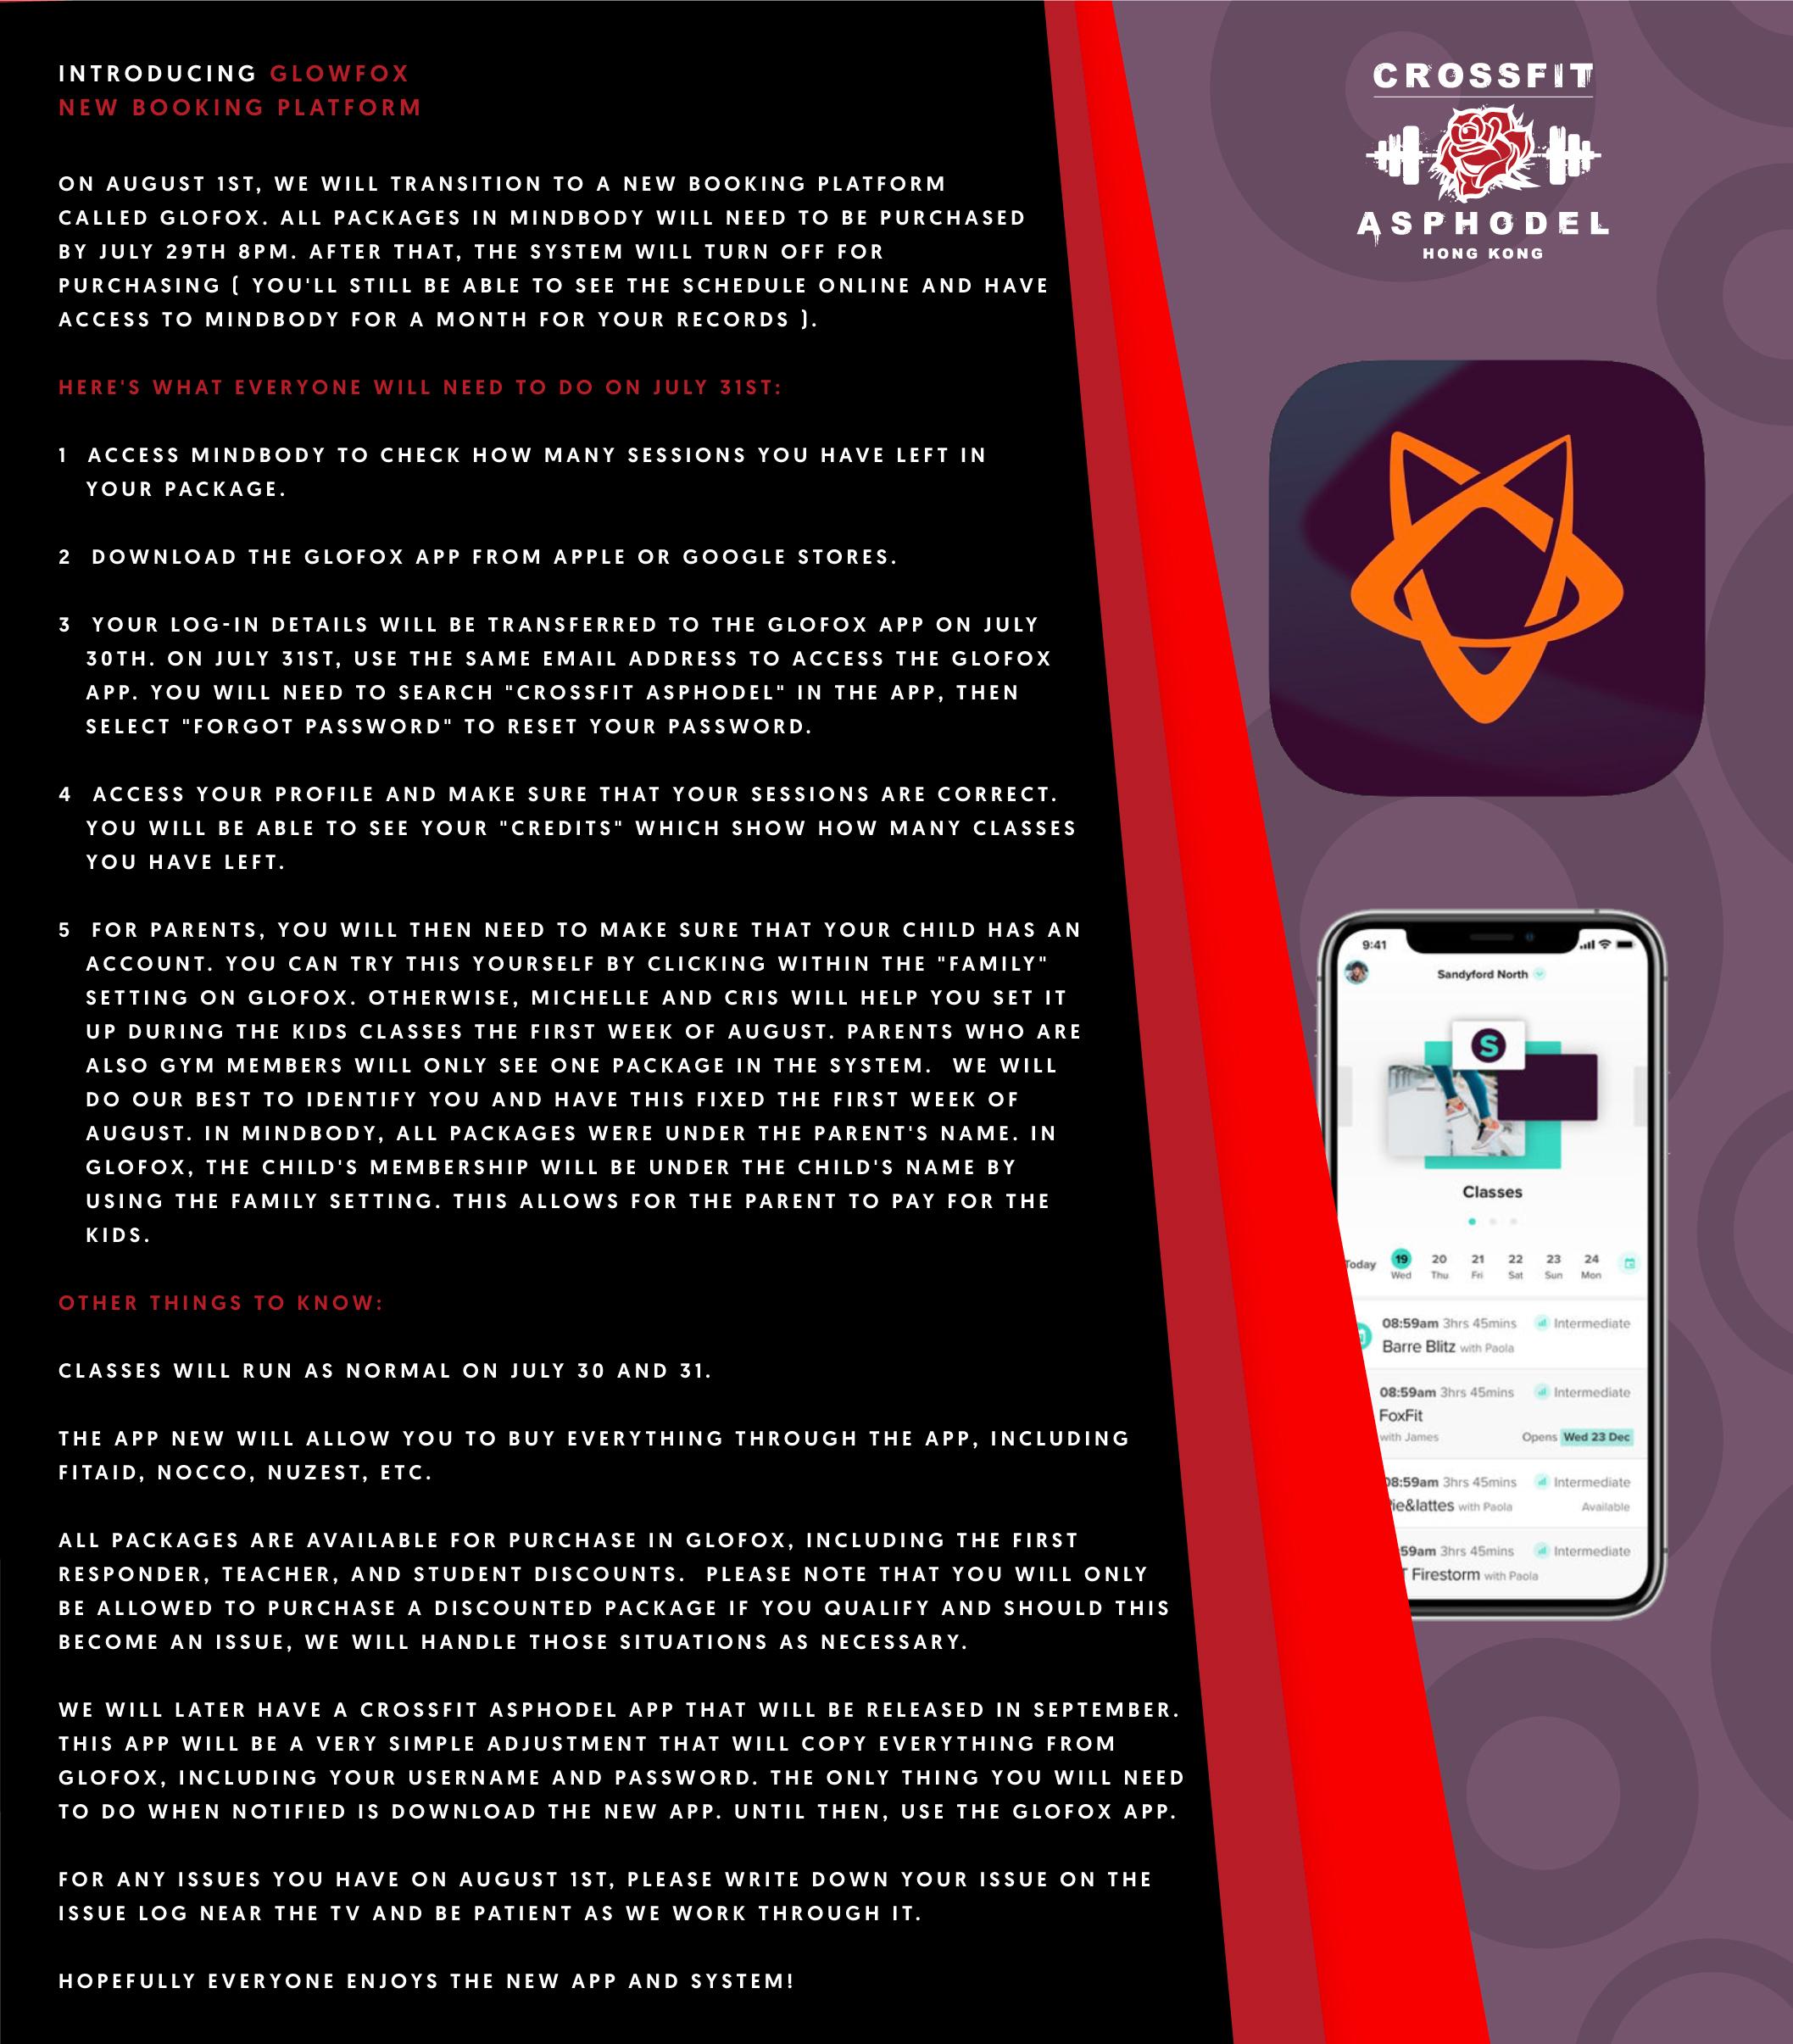 GLOWFOX-Instructions.jpg